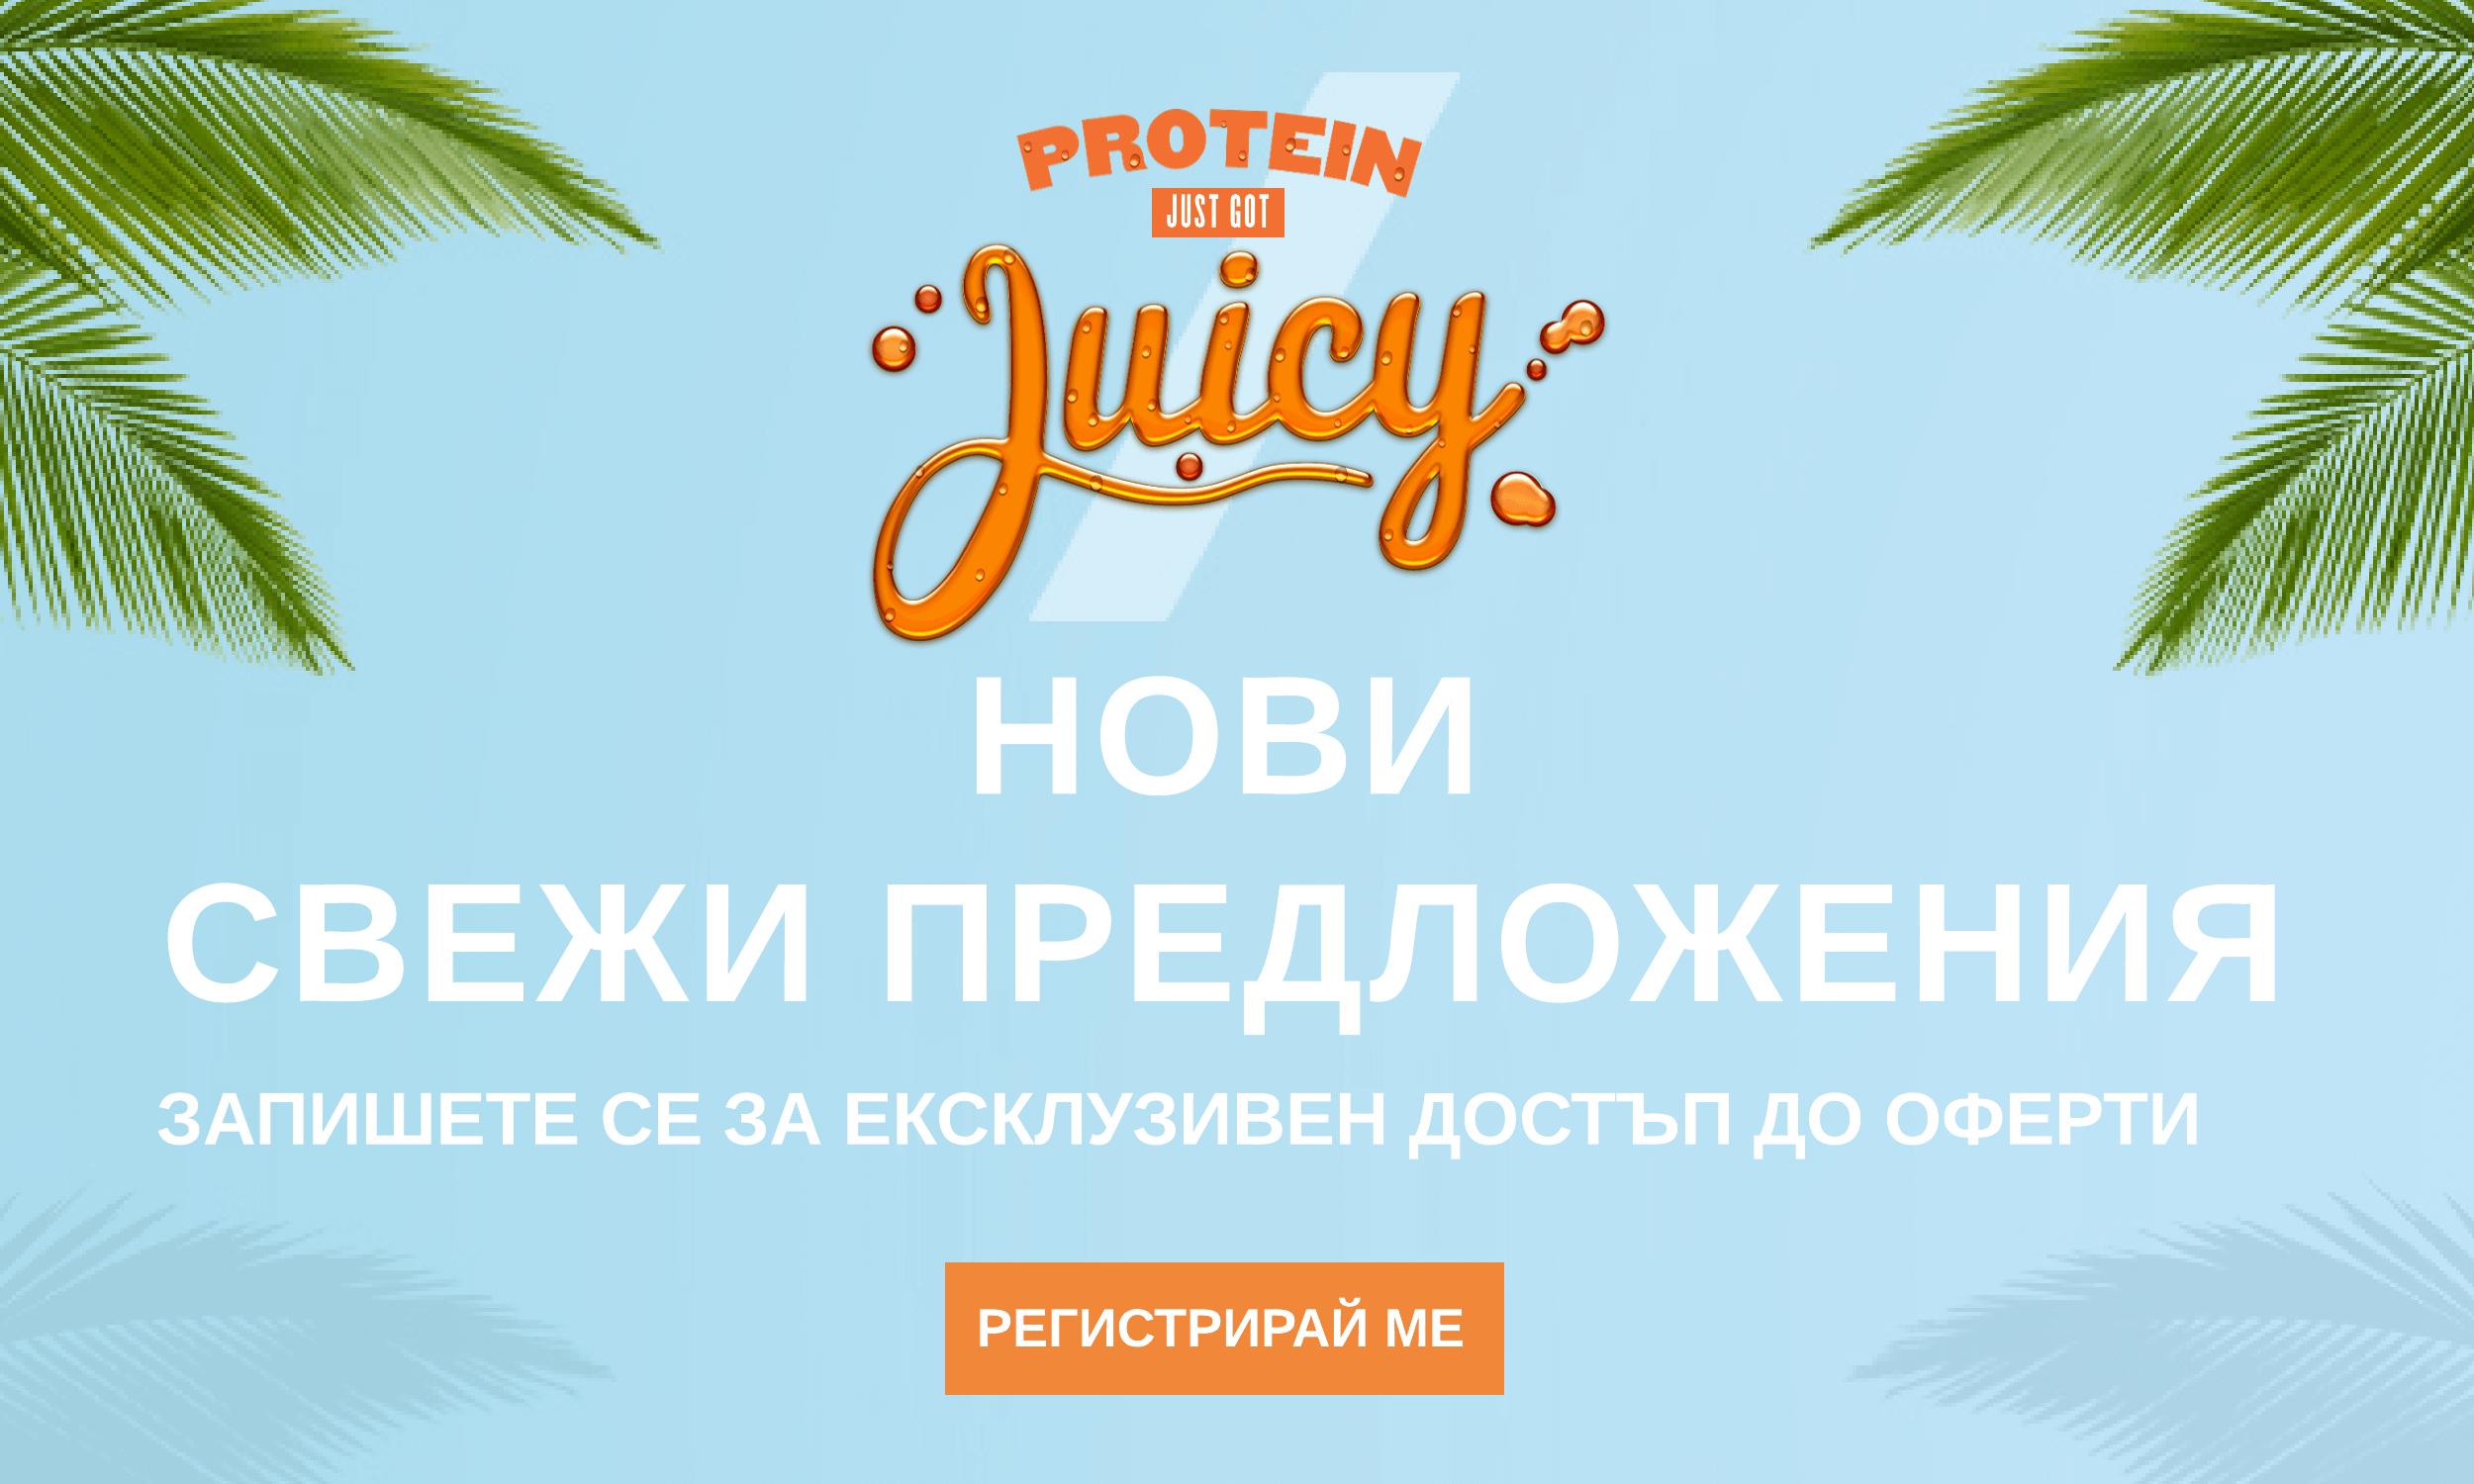 НОВО Clear Whey Протеин